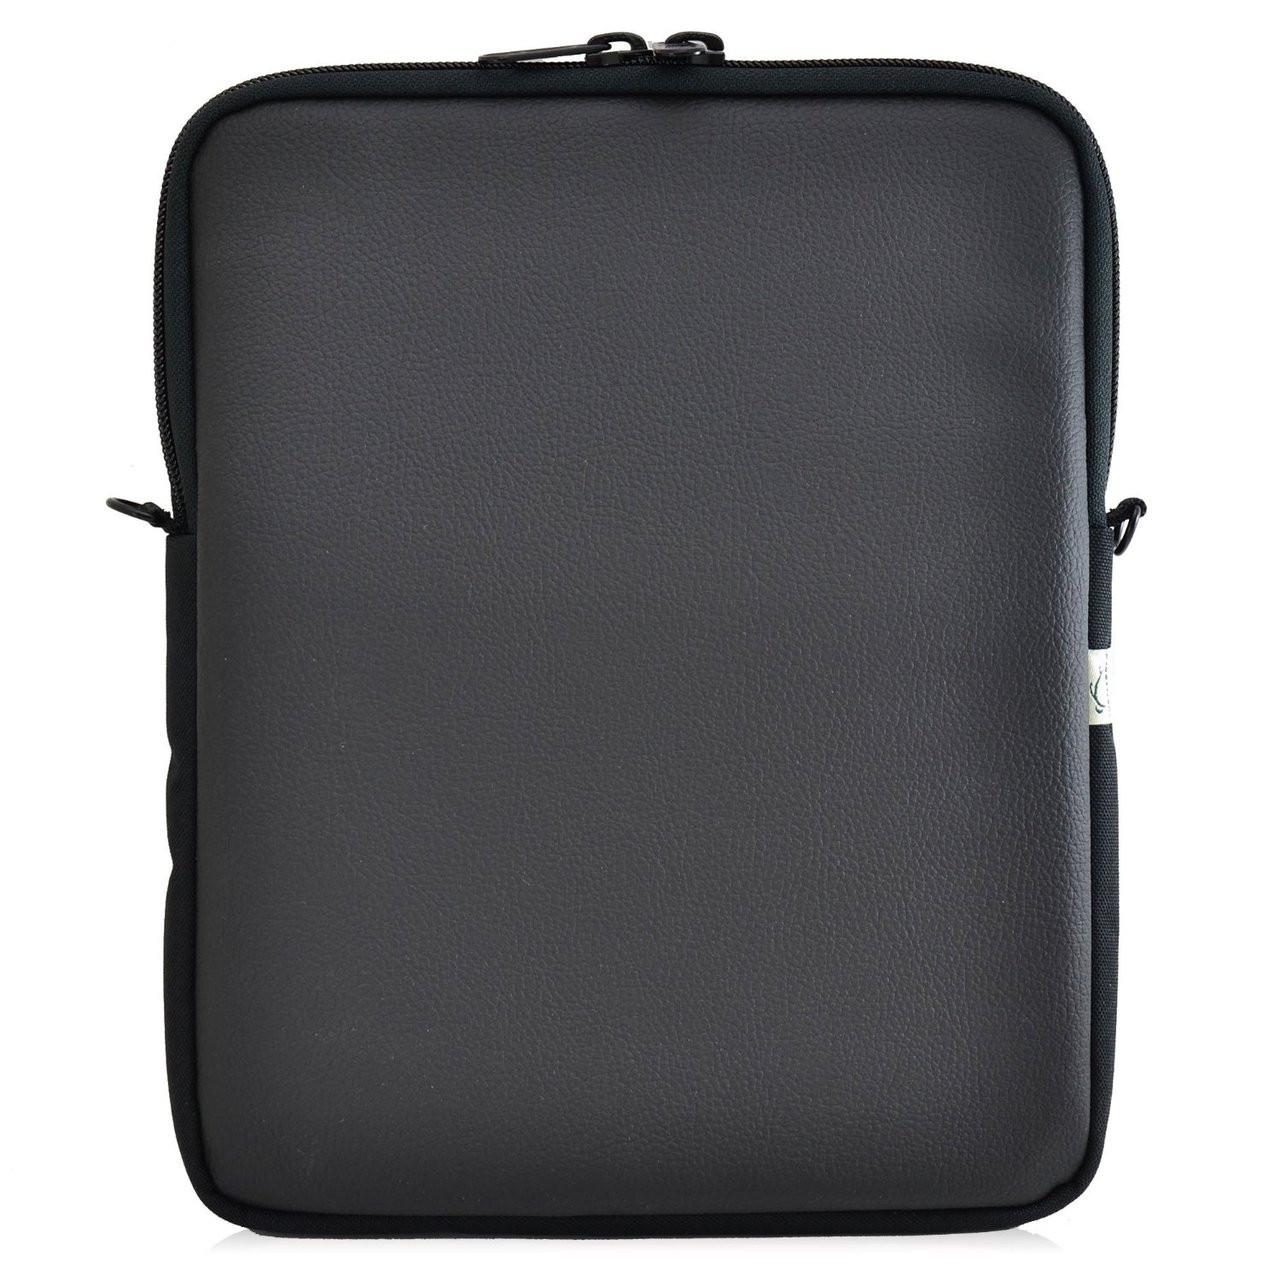 Nylon Universal Tablet Bag